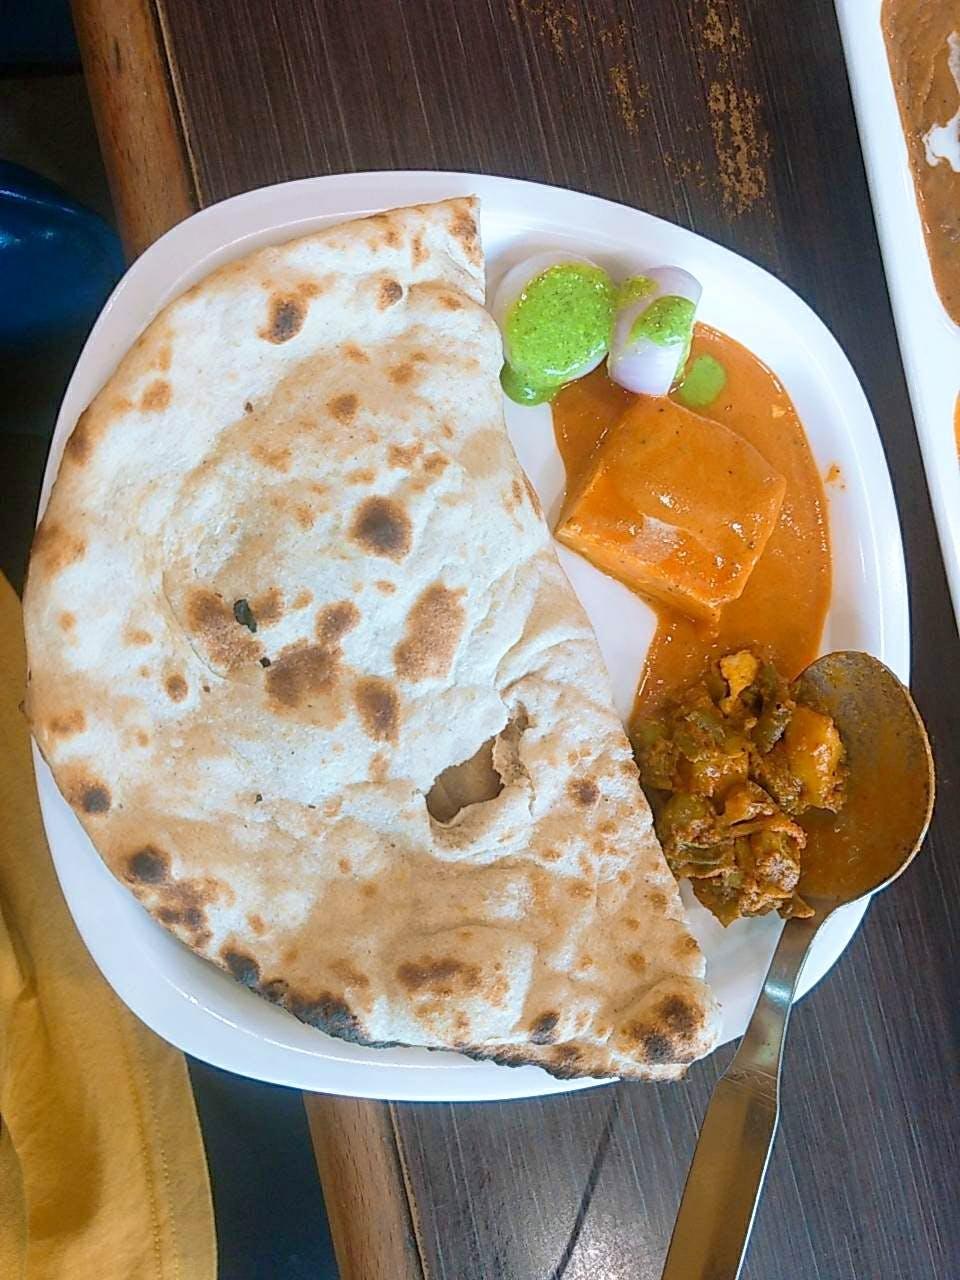 Dish,Food,Cuisine,Naan,Ingredient,Kulcha,Chapati,Roti,Flatbread,Paratha